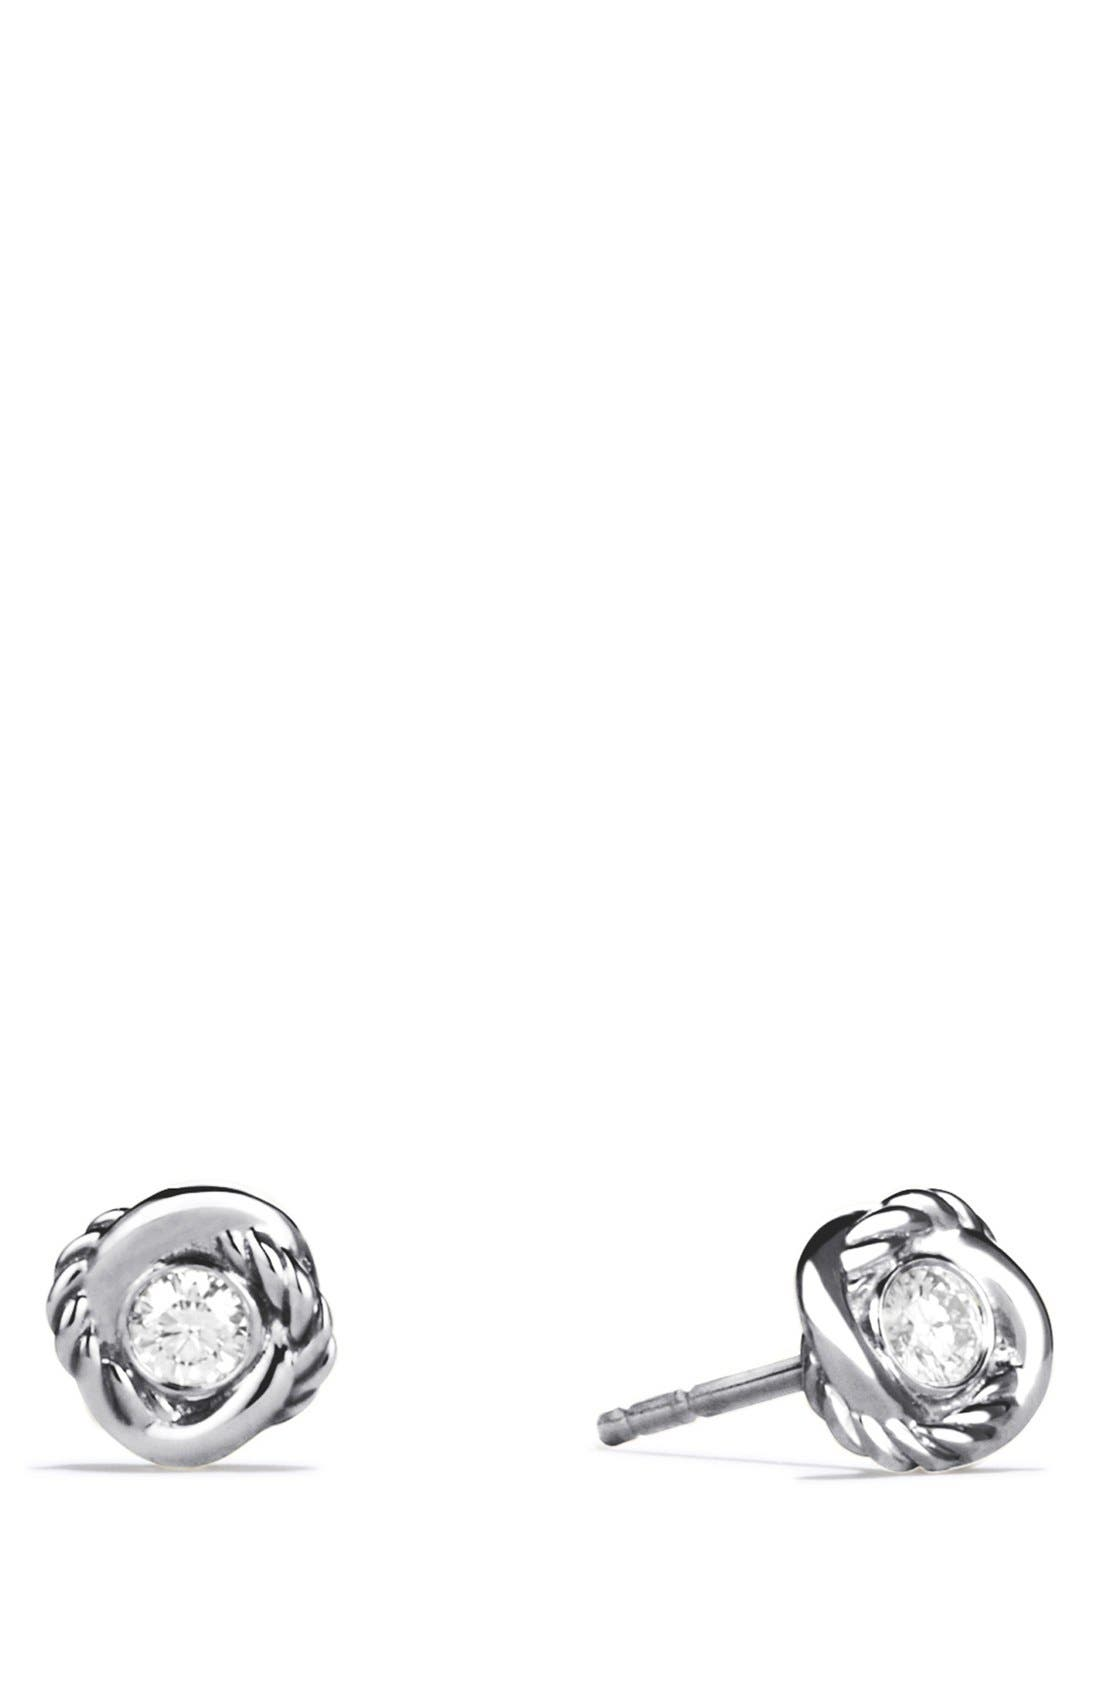 'Infinity' Earrings with Diamonds,                         Main,                         color, DIAMOND